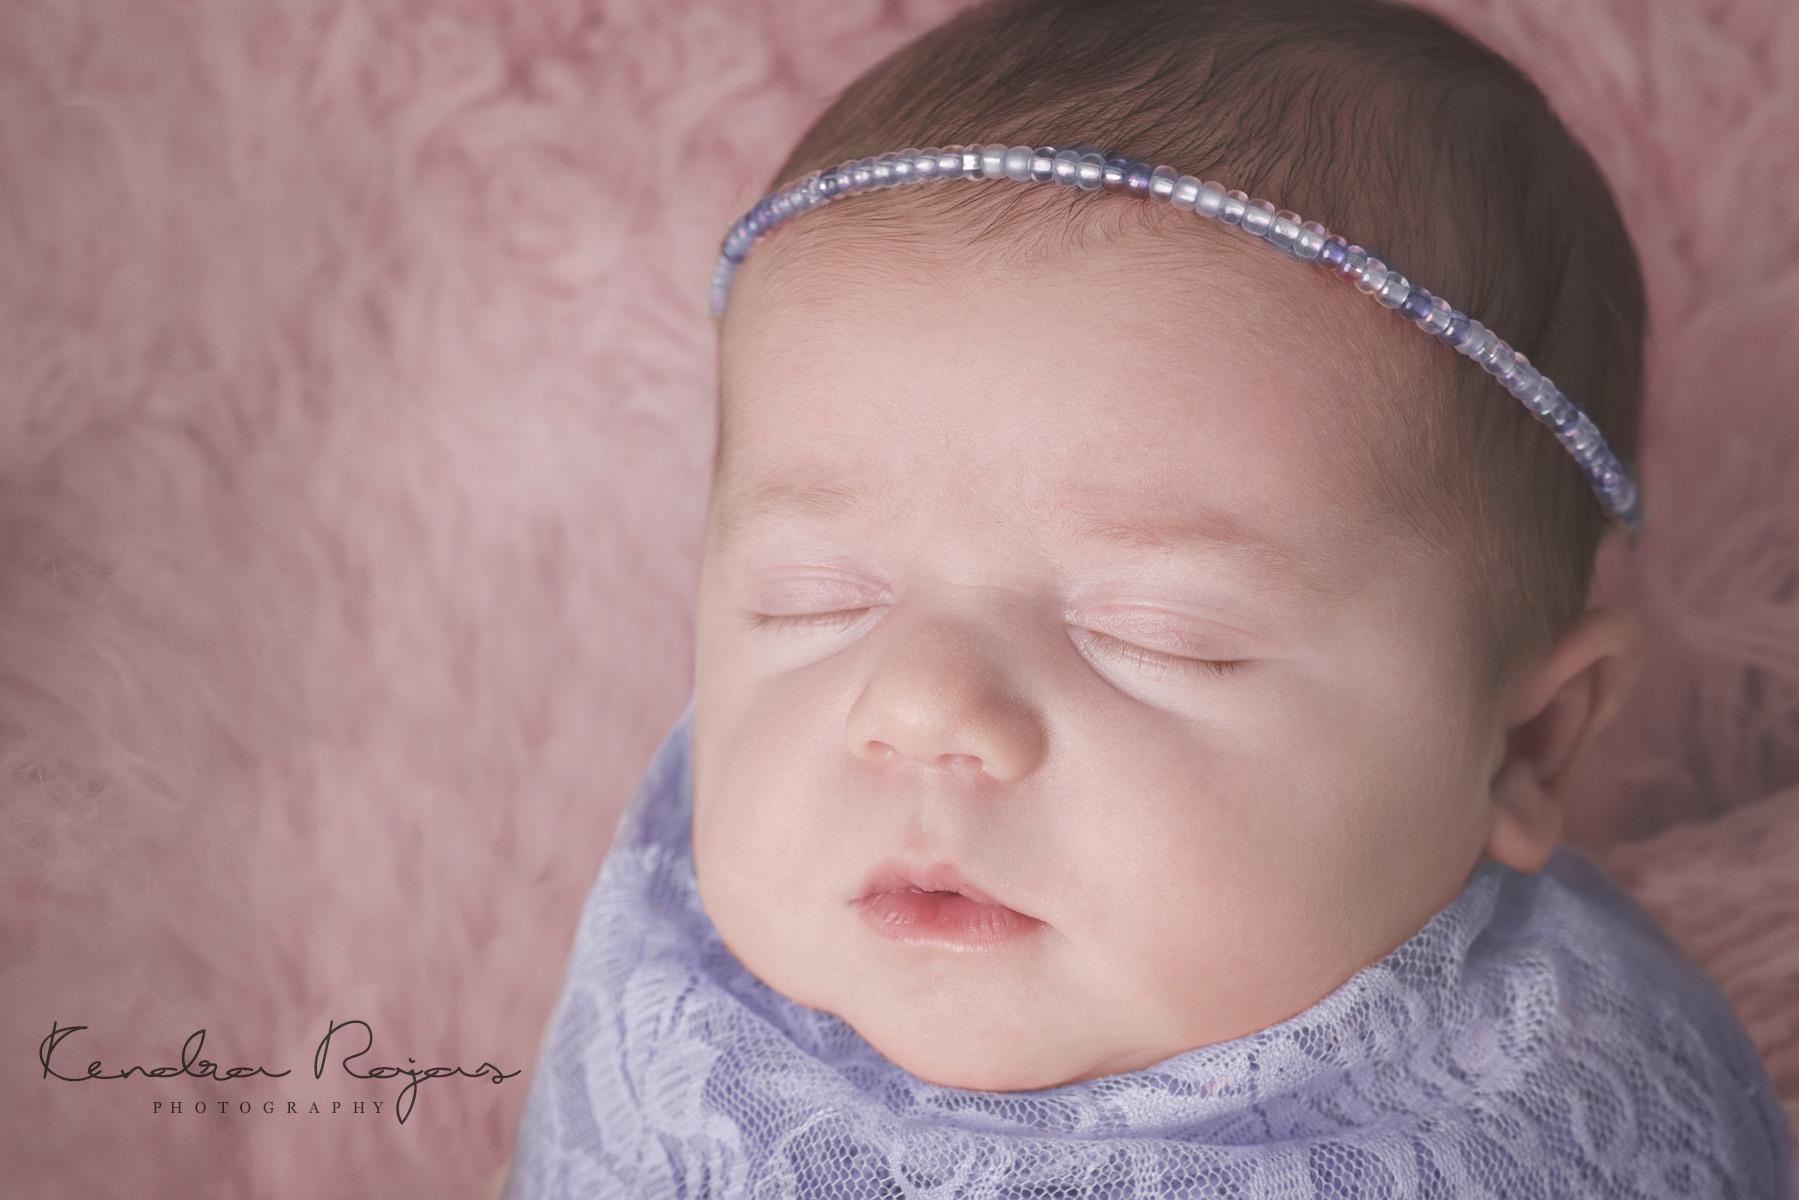 Newborn_Charlotte 112216_07_LOW_Social.jpg